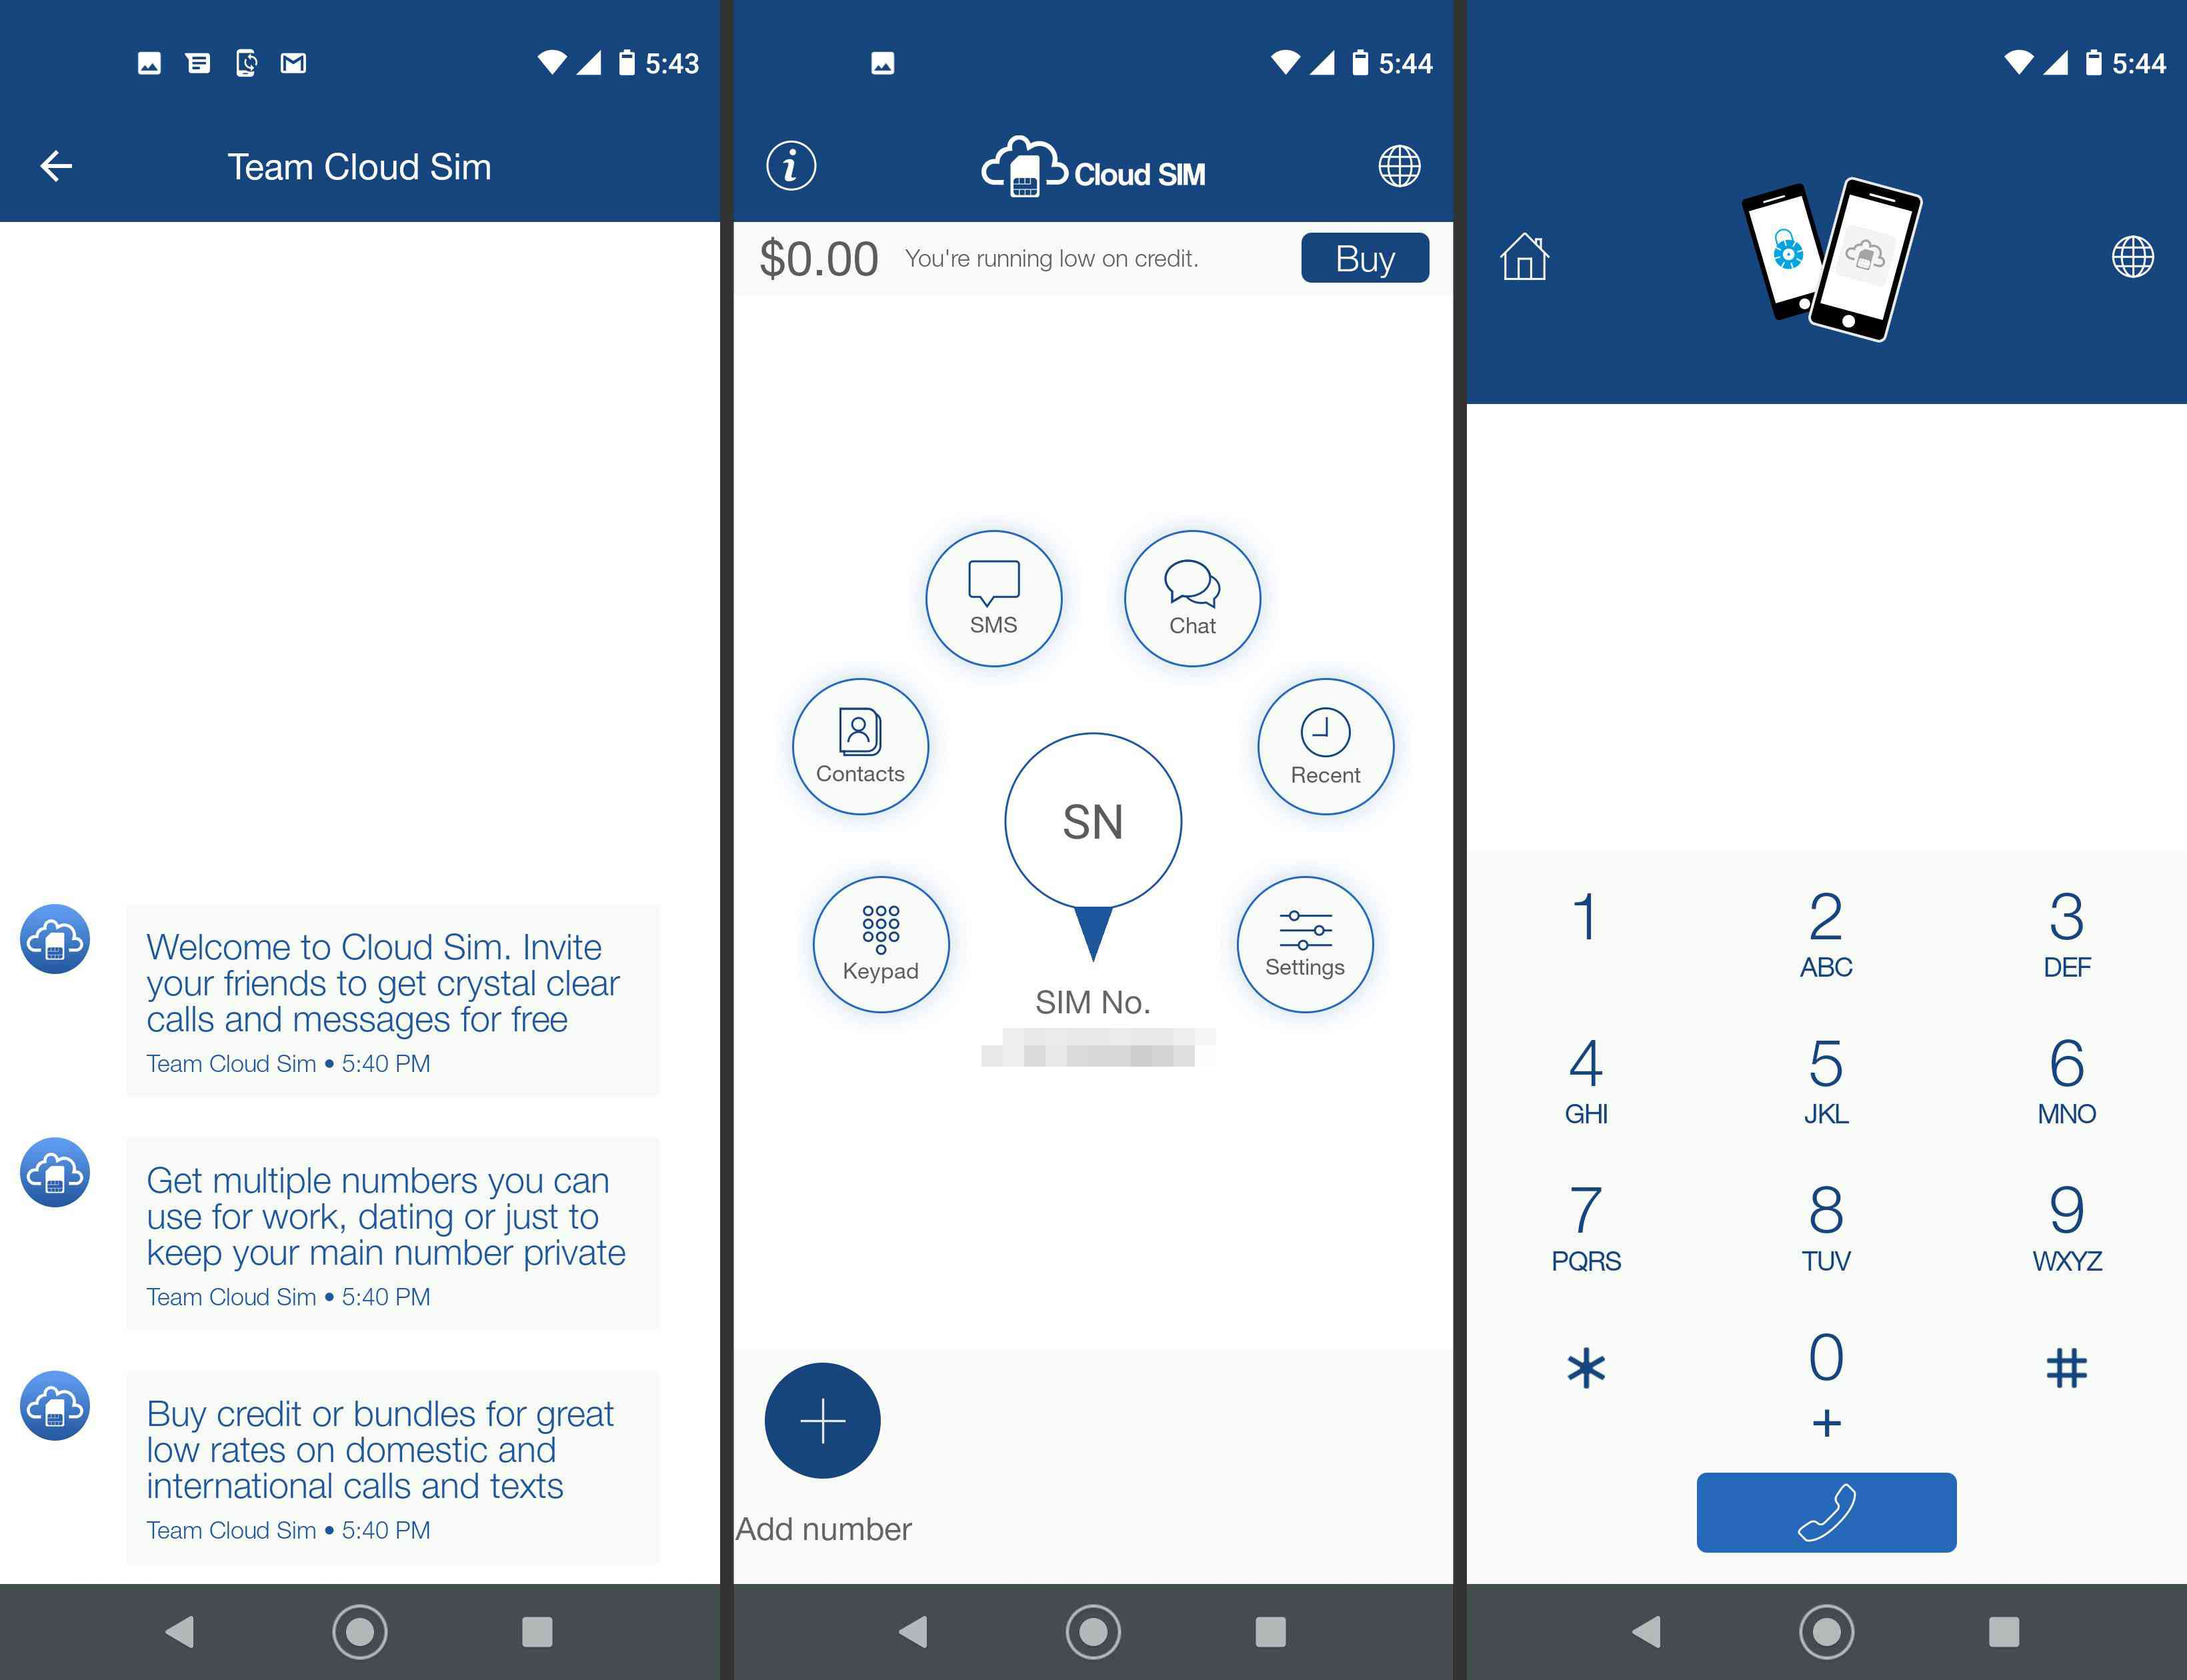 Cloud Sim app on Android